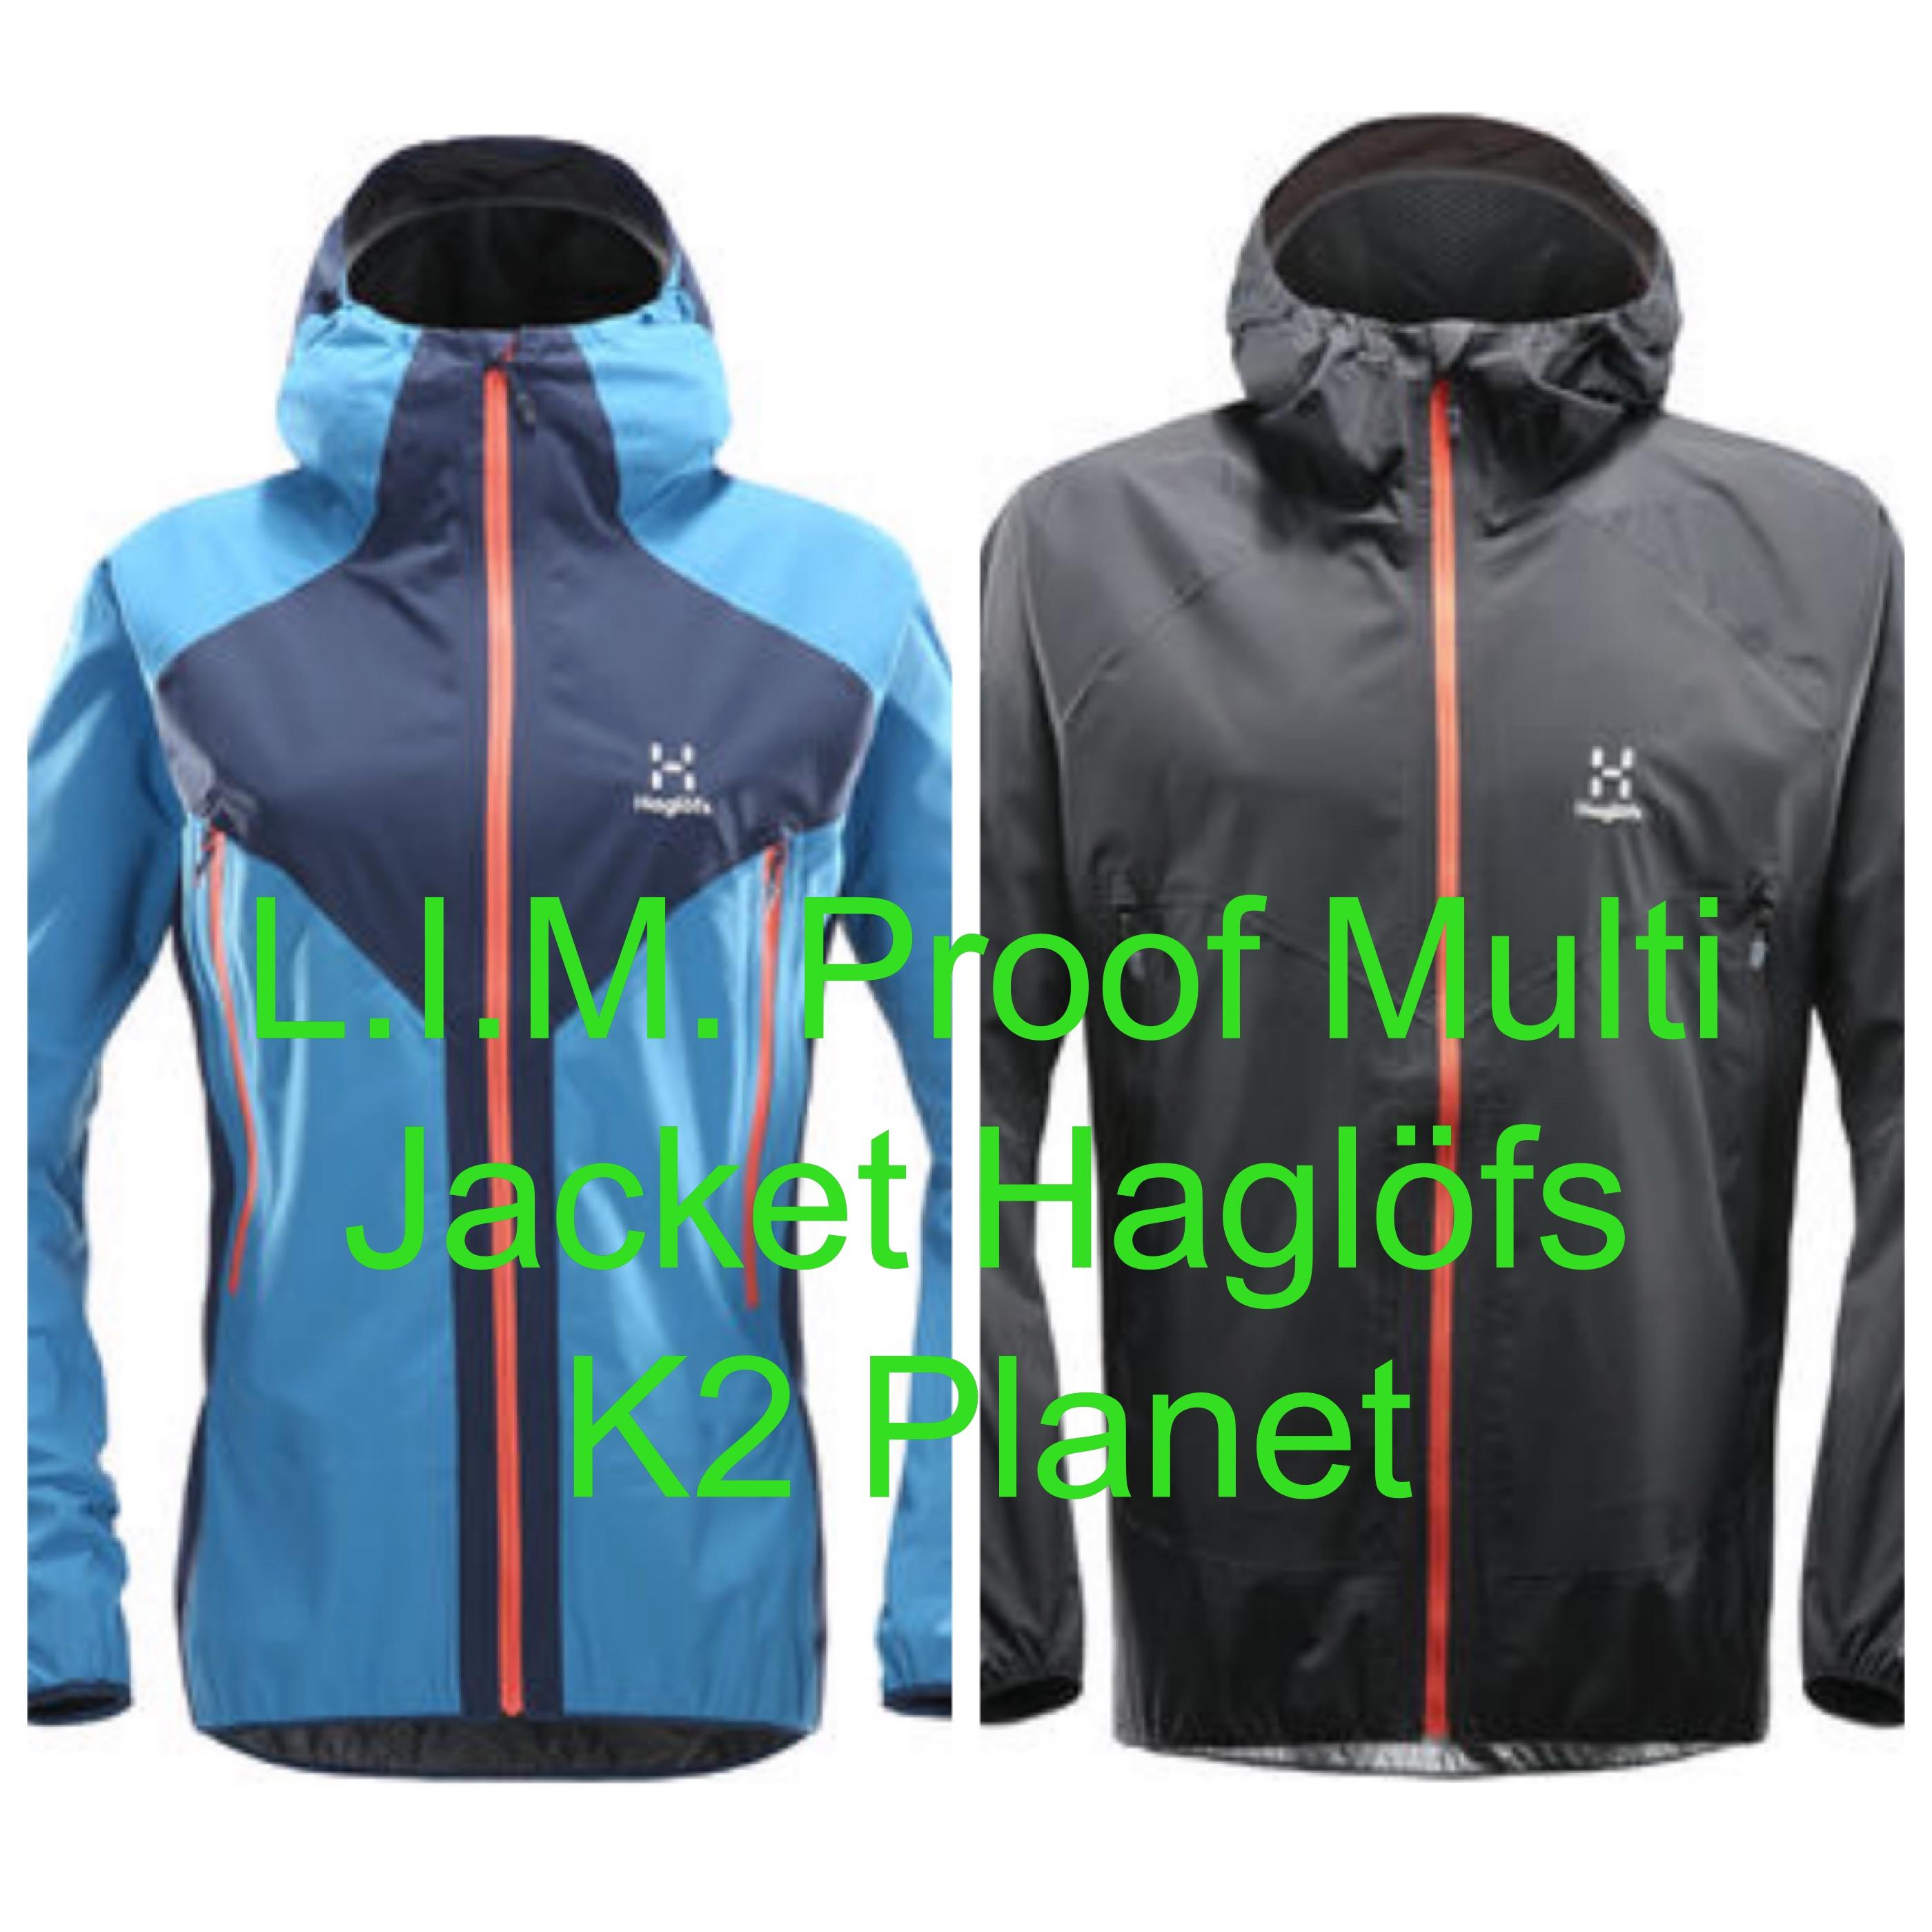 L.I.M. Proof Multi Jacket Haglöfs